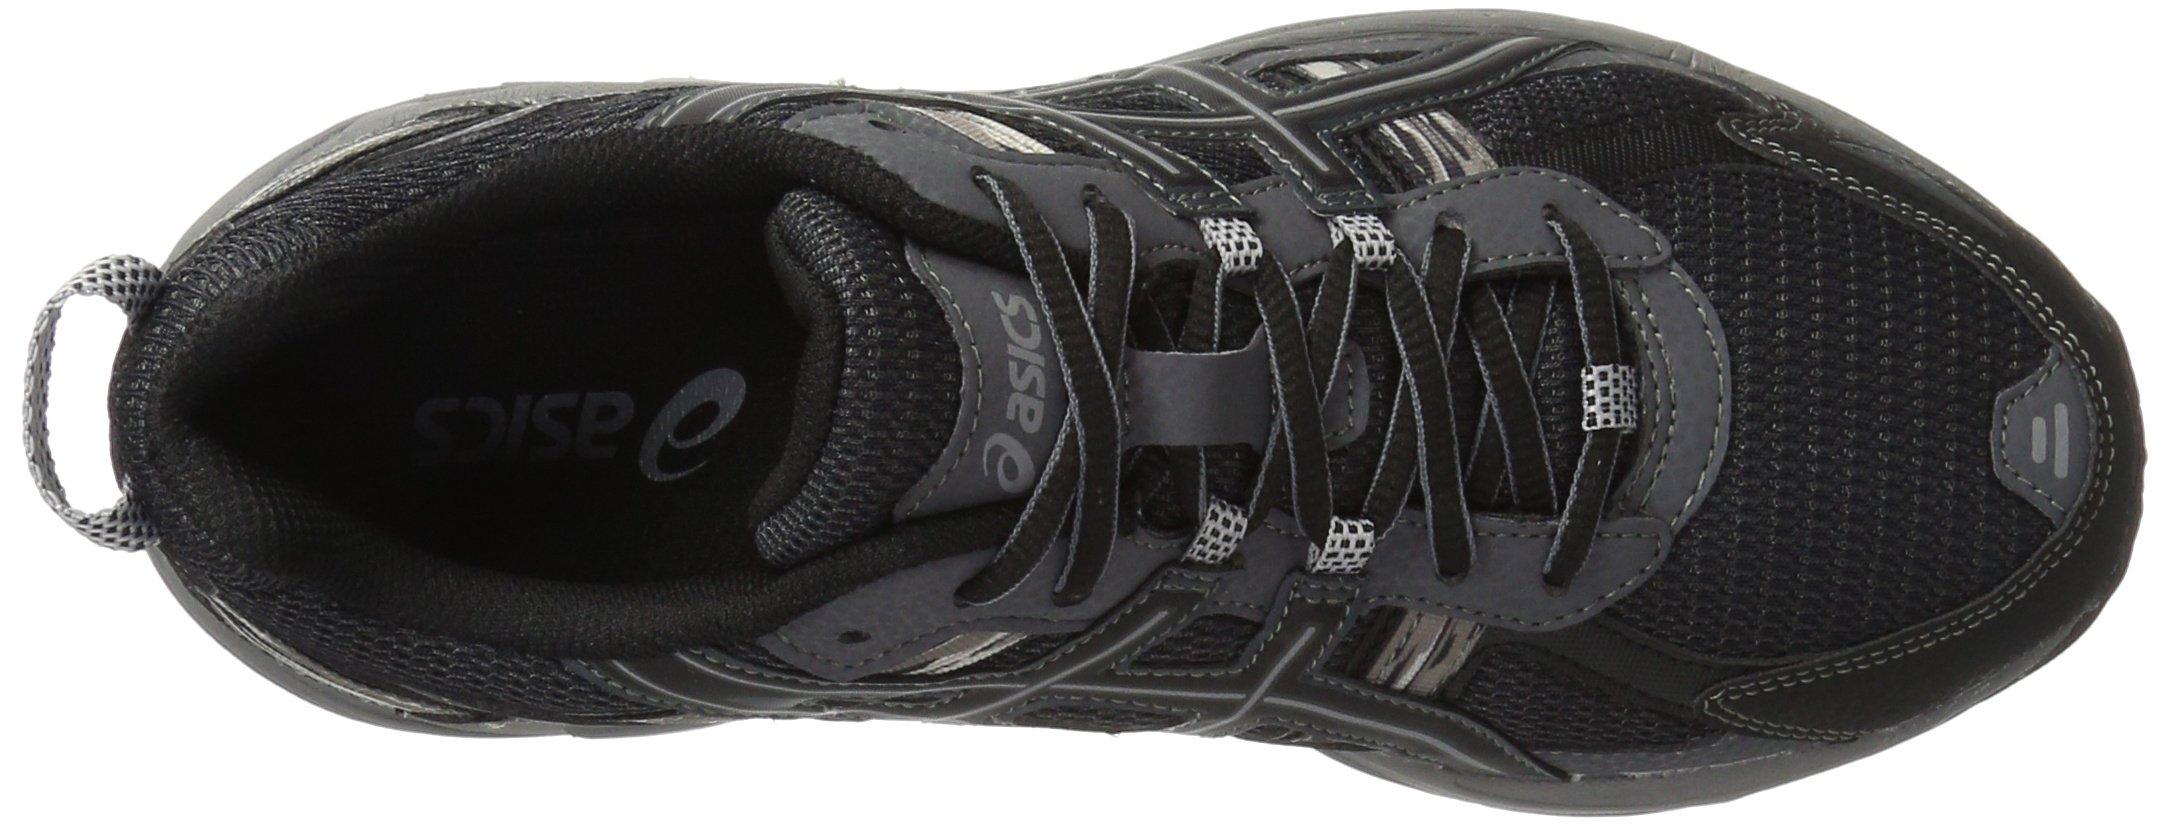 ASICS Men's Gel-Venture 5-M, Black/Onyx/Charcoal, 8 M US by ASICS (Image #8)